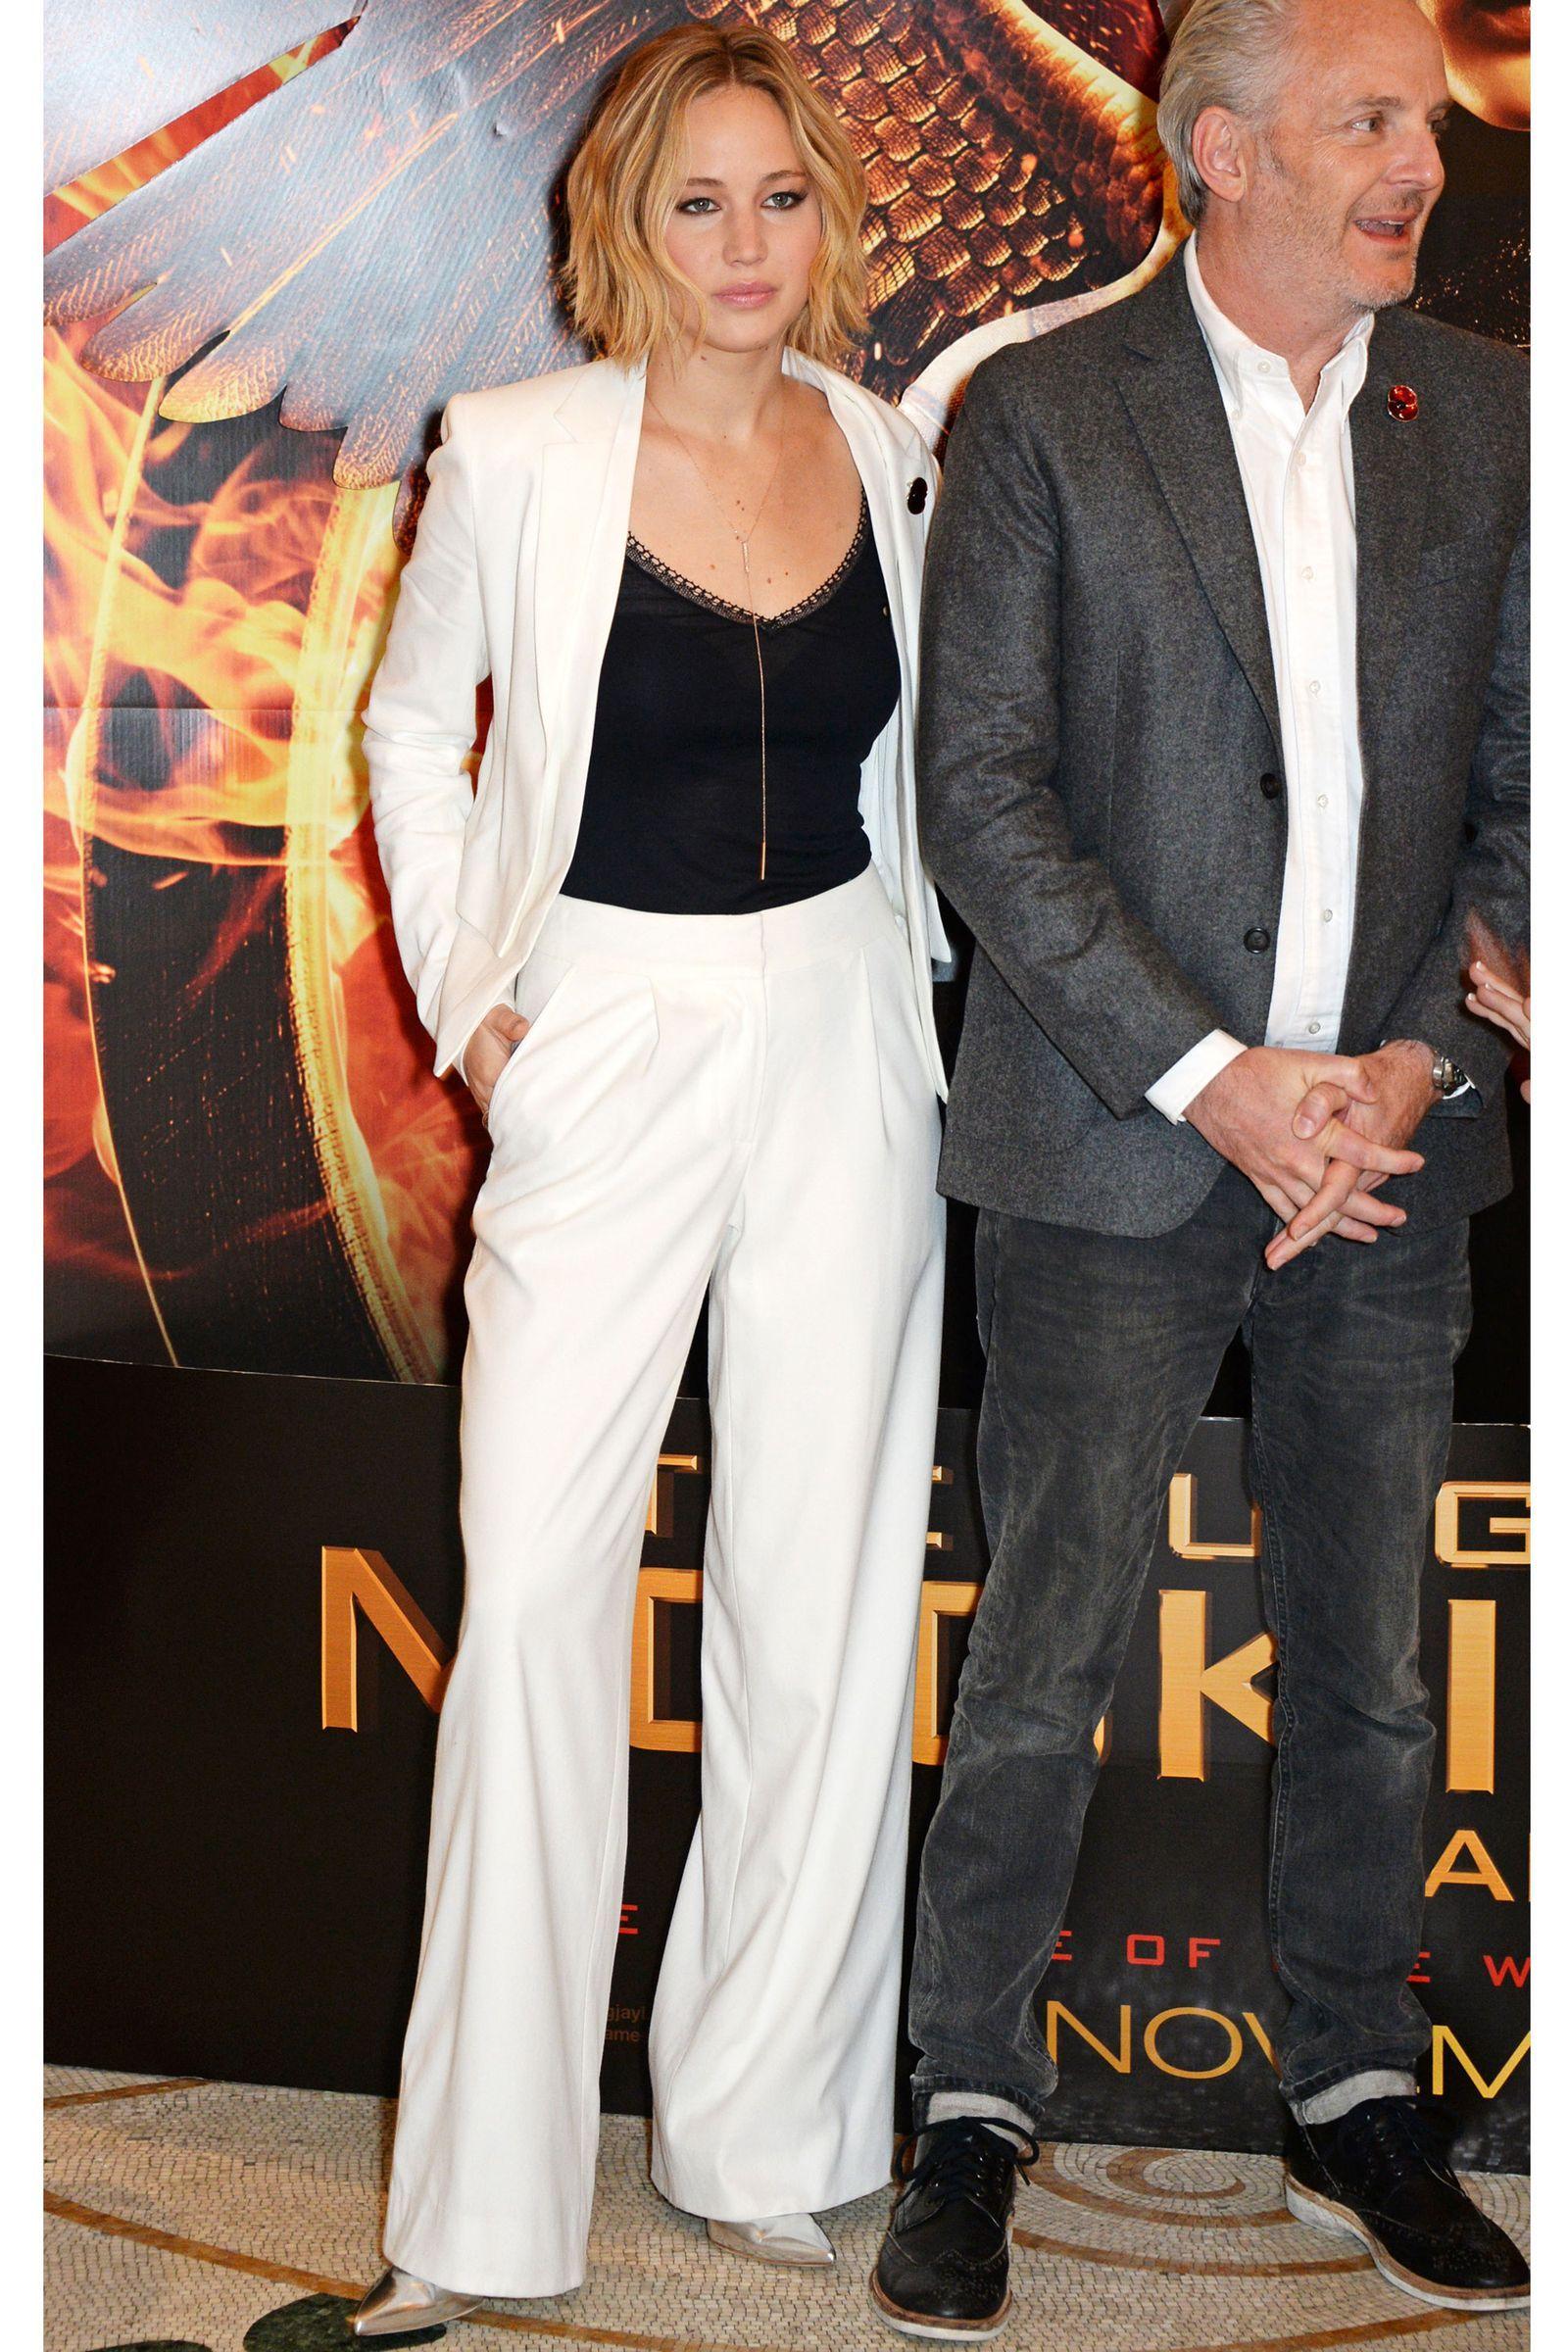 The Hunger Games Jennifer Lawrence: 10 Hot Instagram Pics You